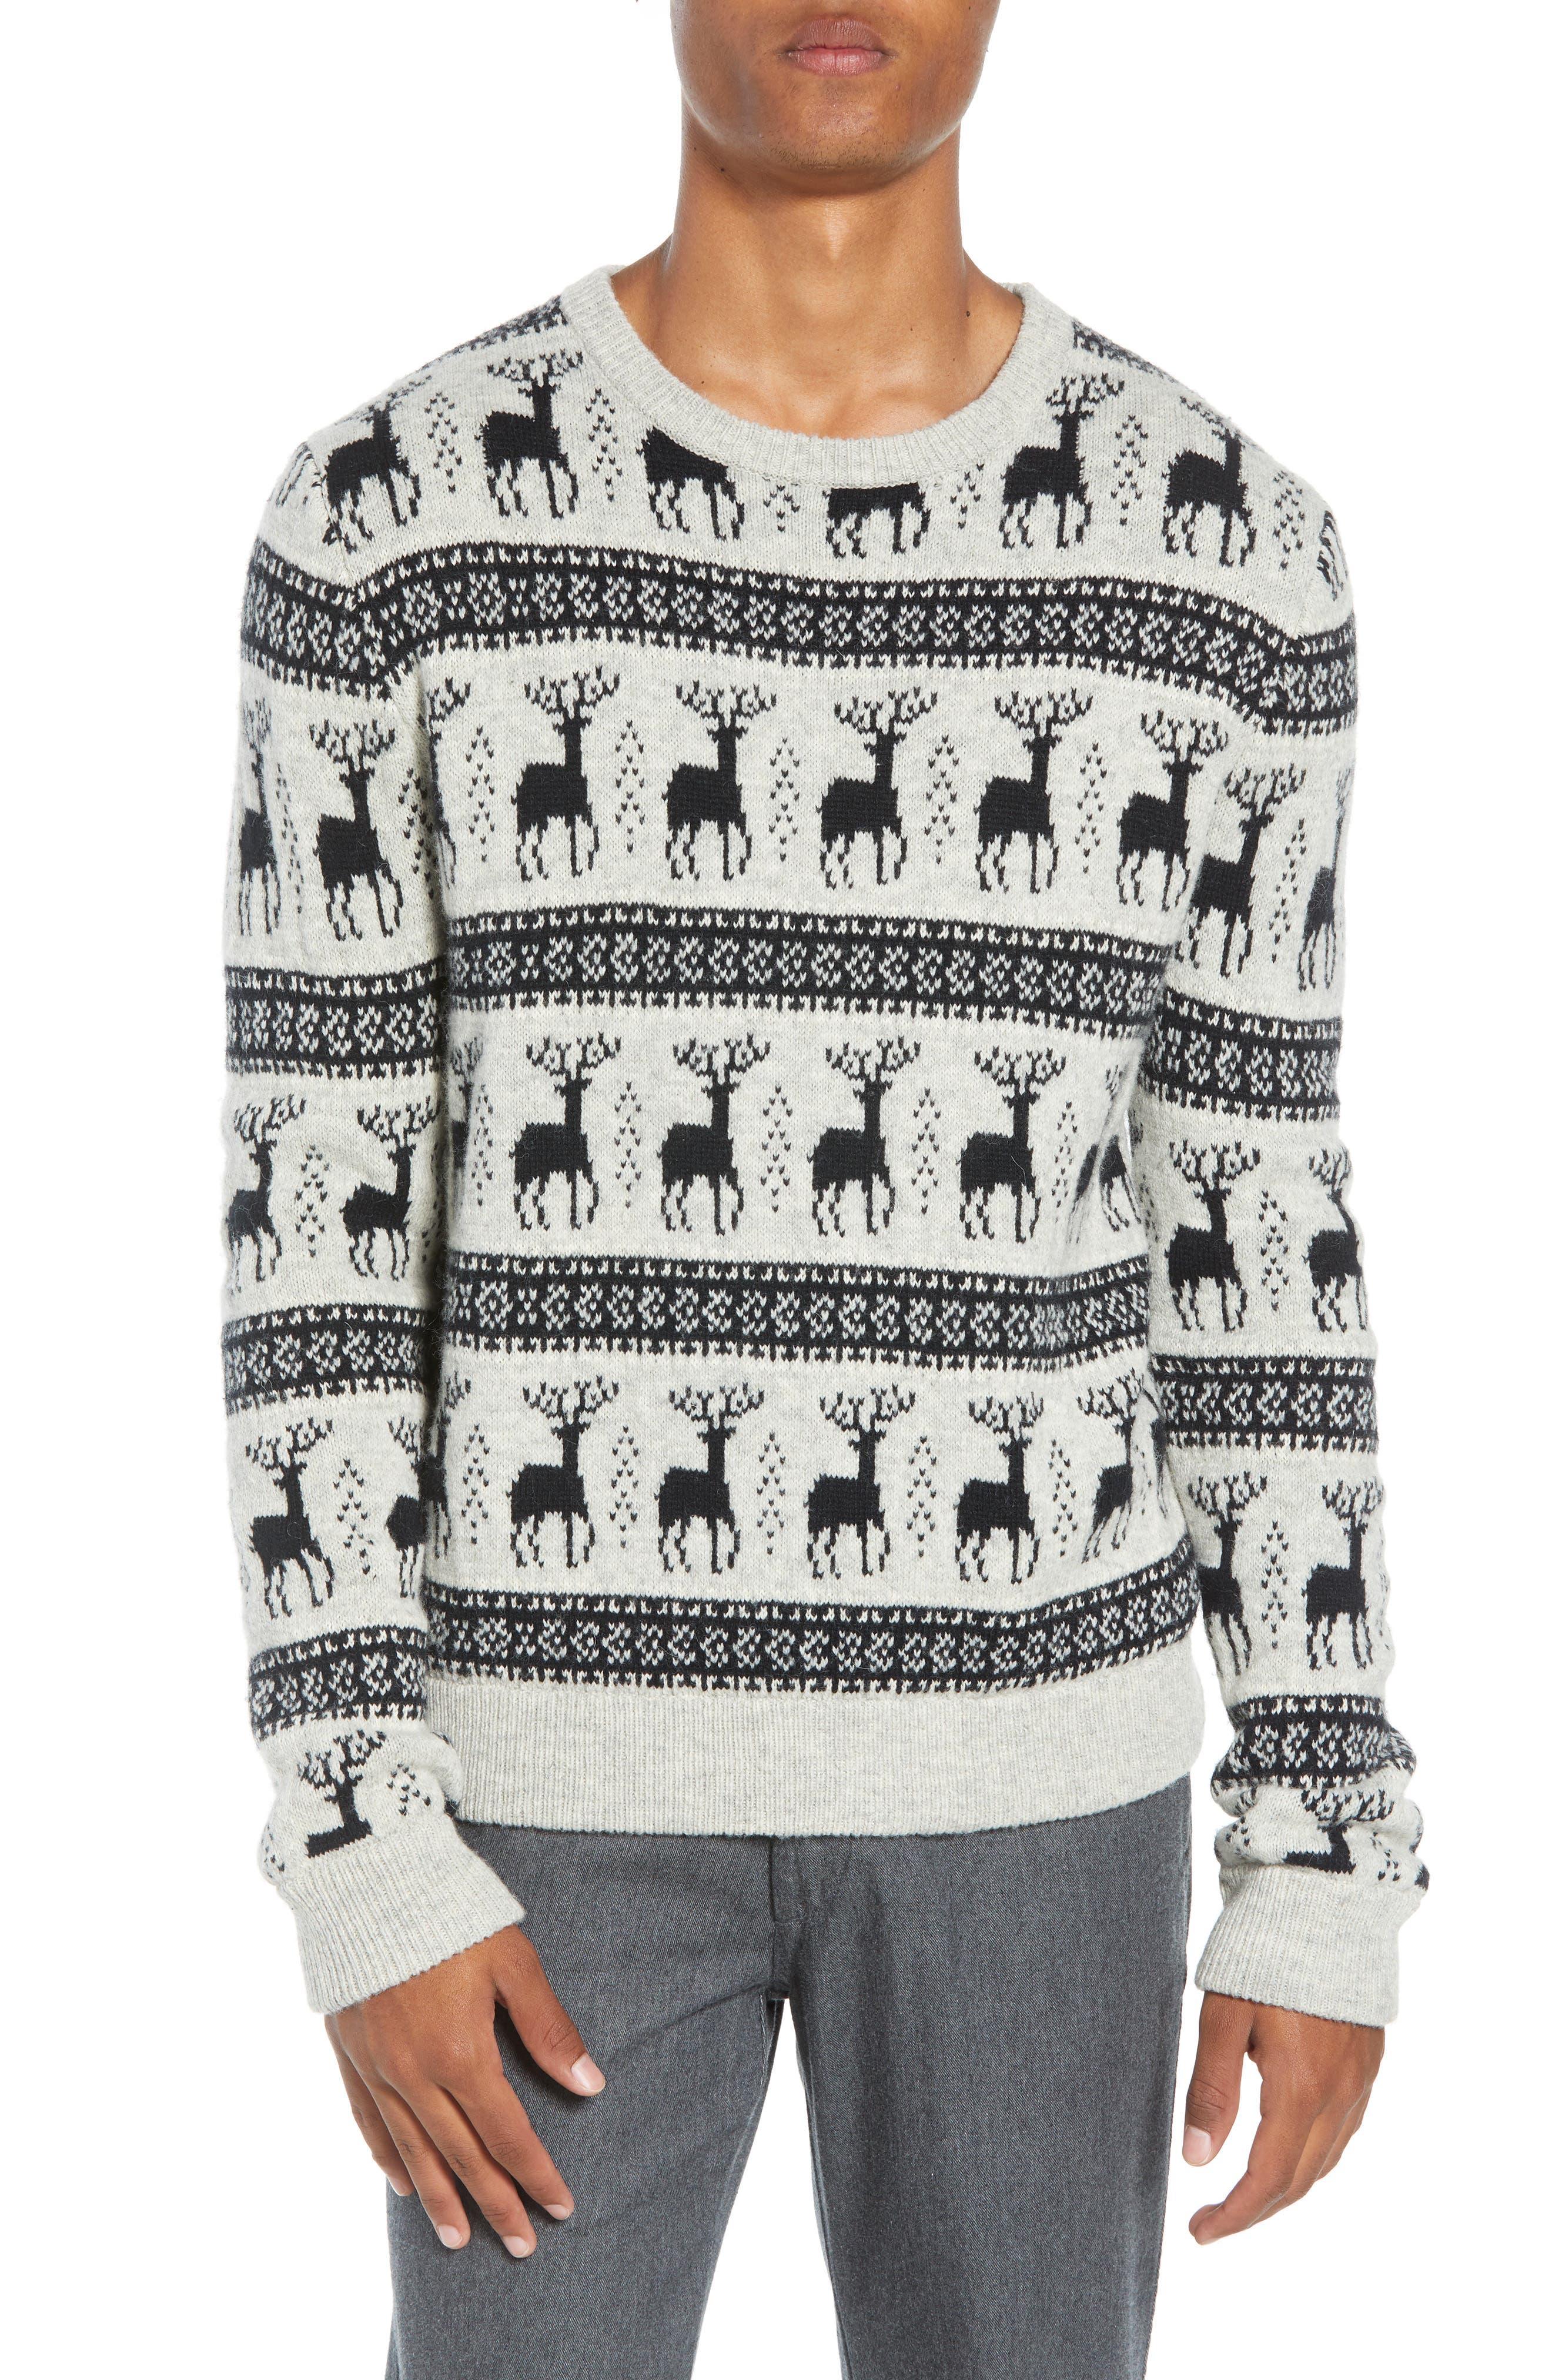 Cedar Slim Fit Crewneck Sweater,                             Main thumbnail 1, color,                             LIGHT HEATHER GREY